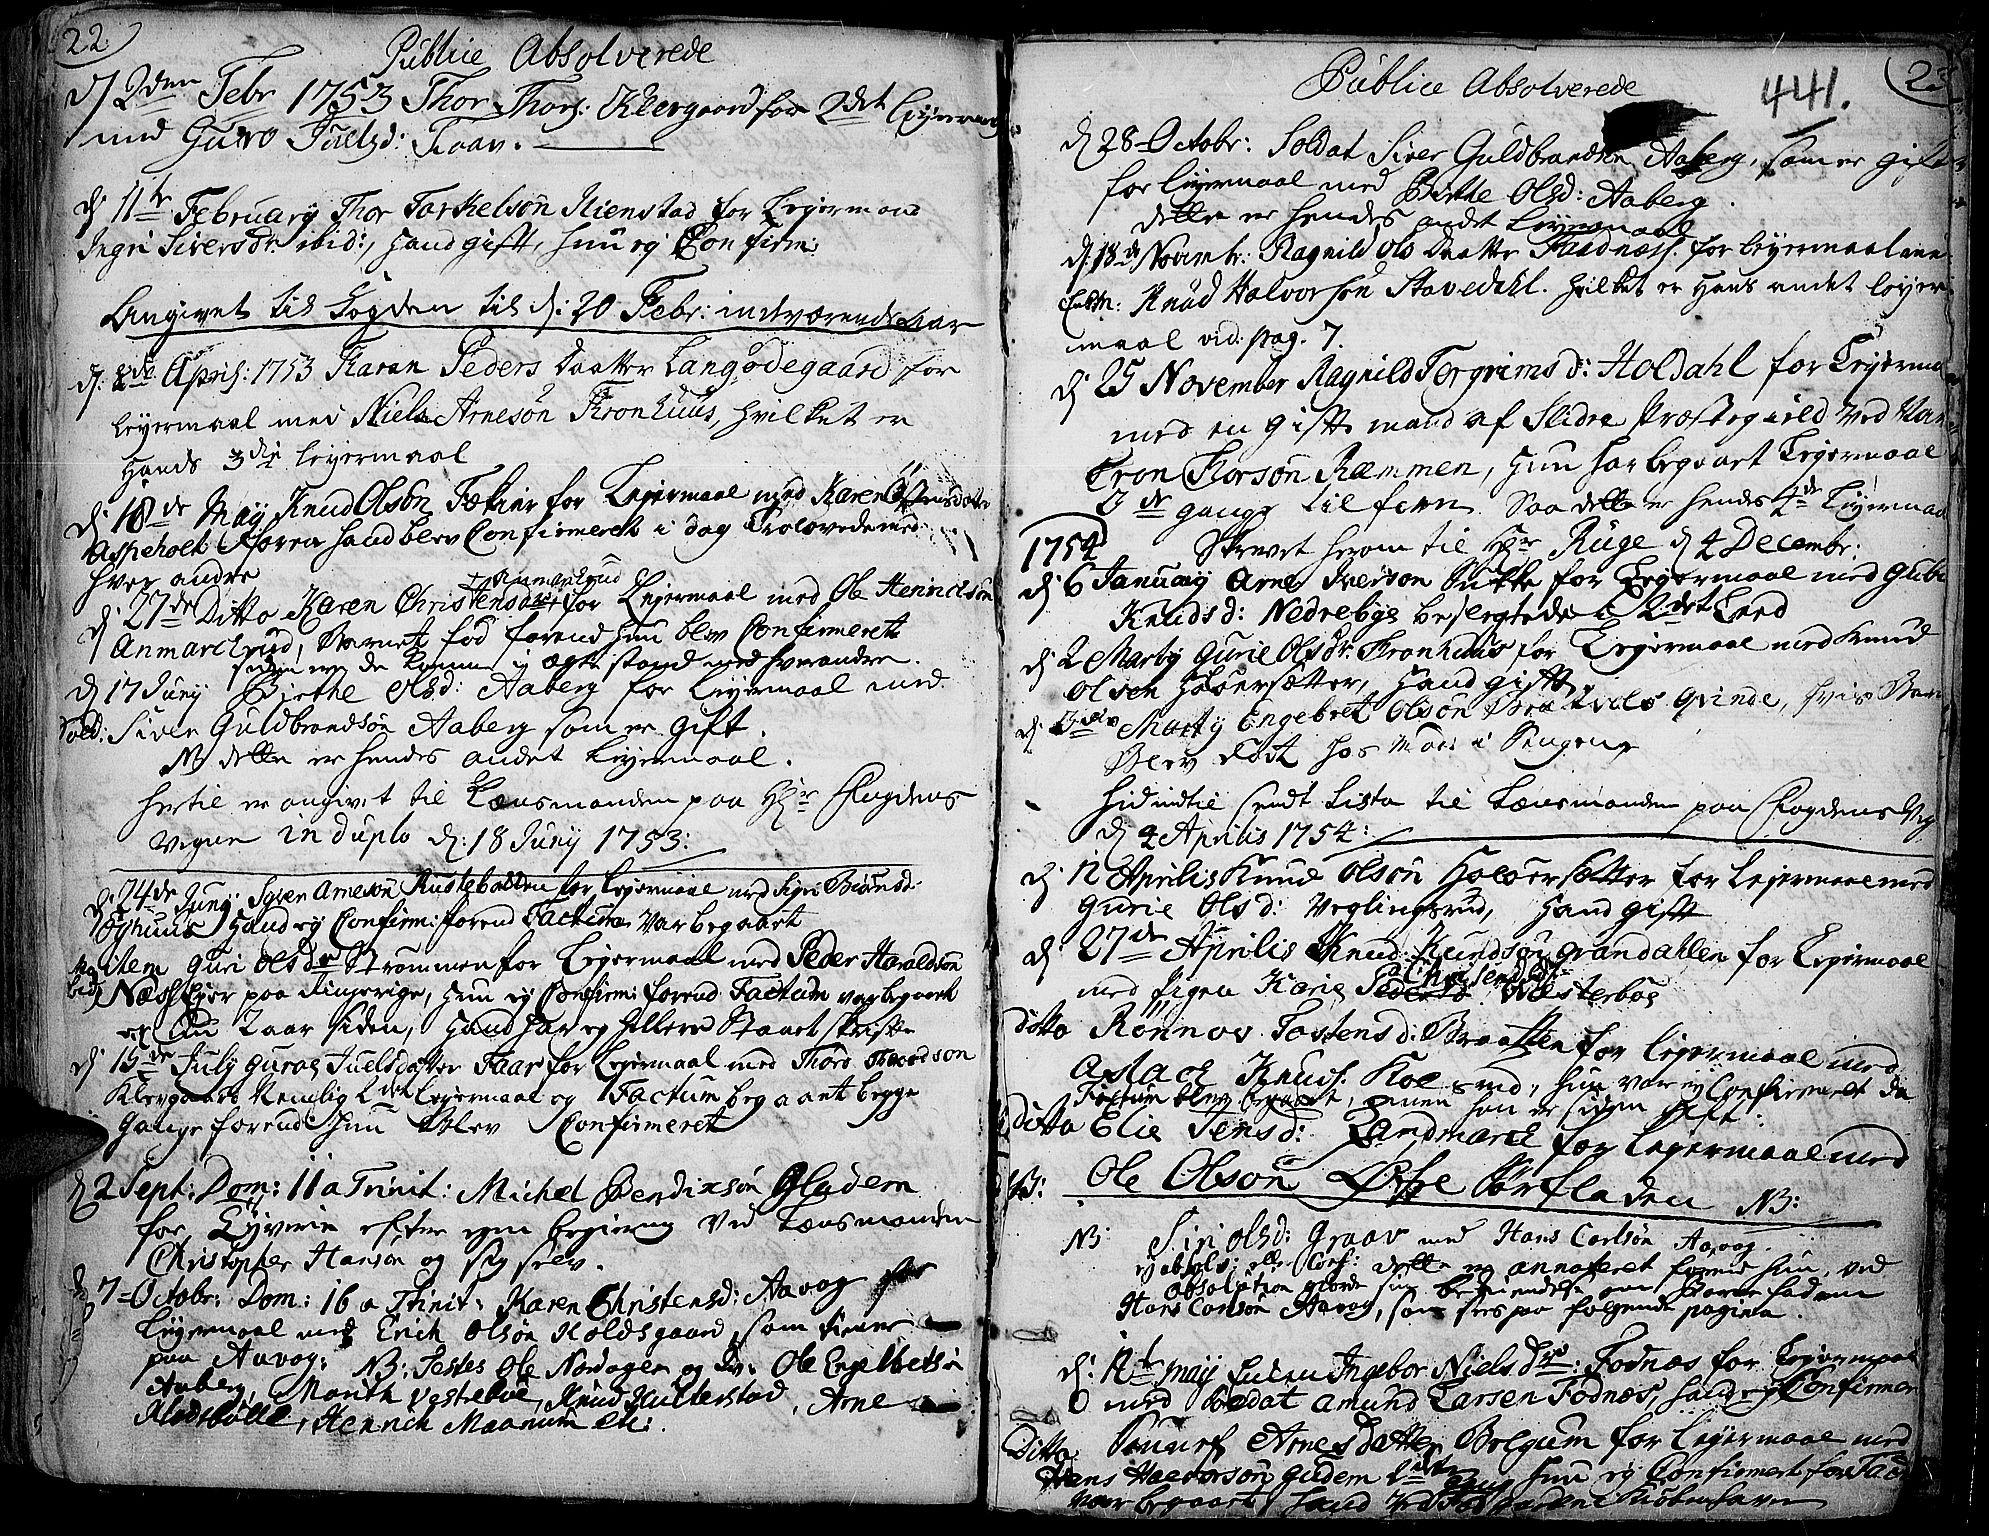 SAH, Aurdal prestekontor, Ministerialbok nr. 4, 1730-1762, s. 22-23